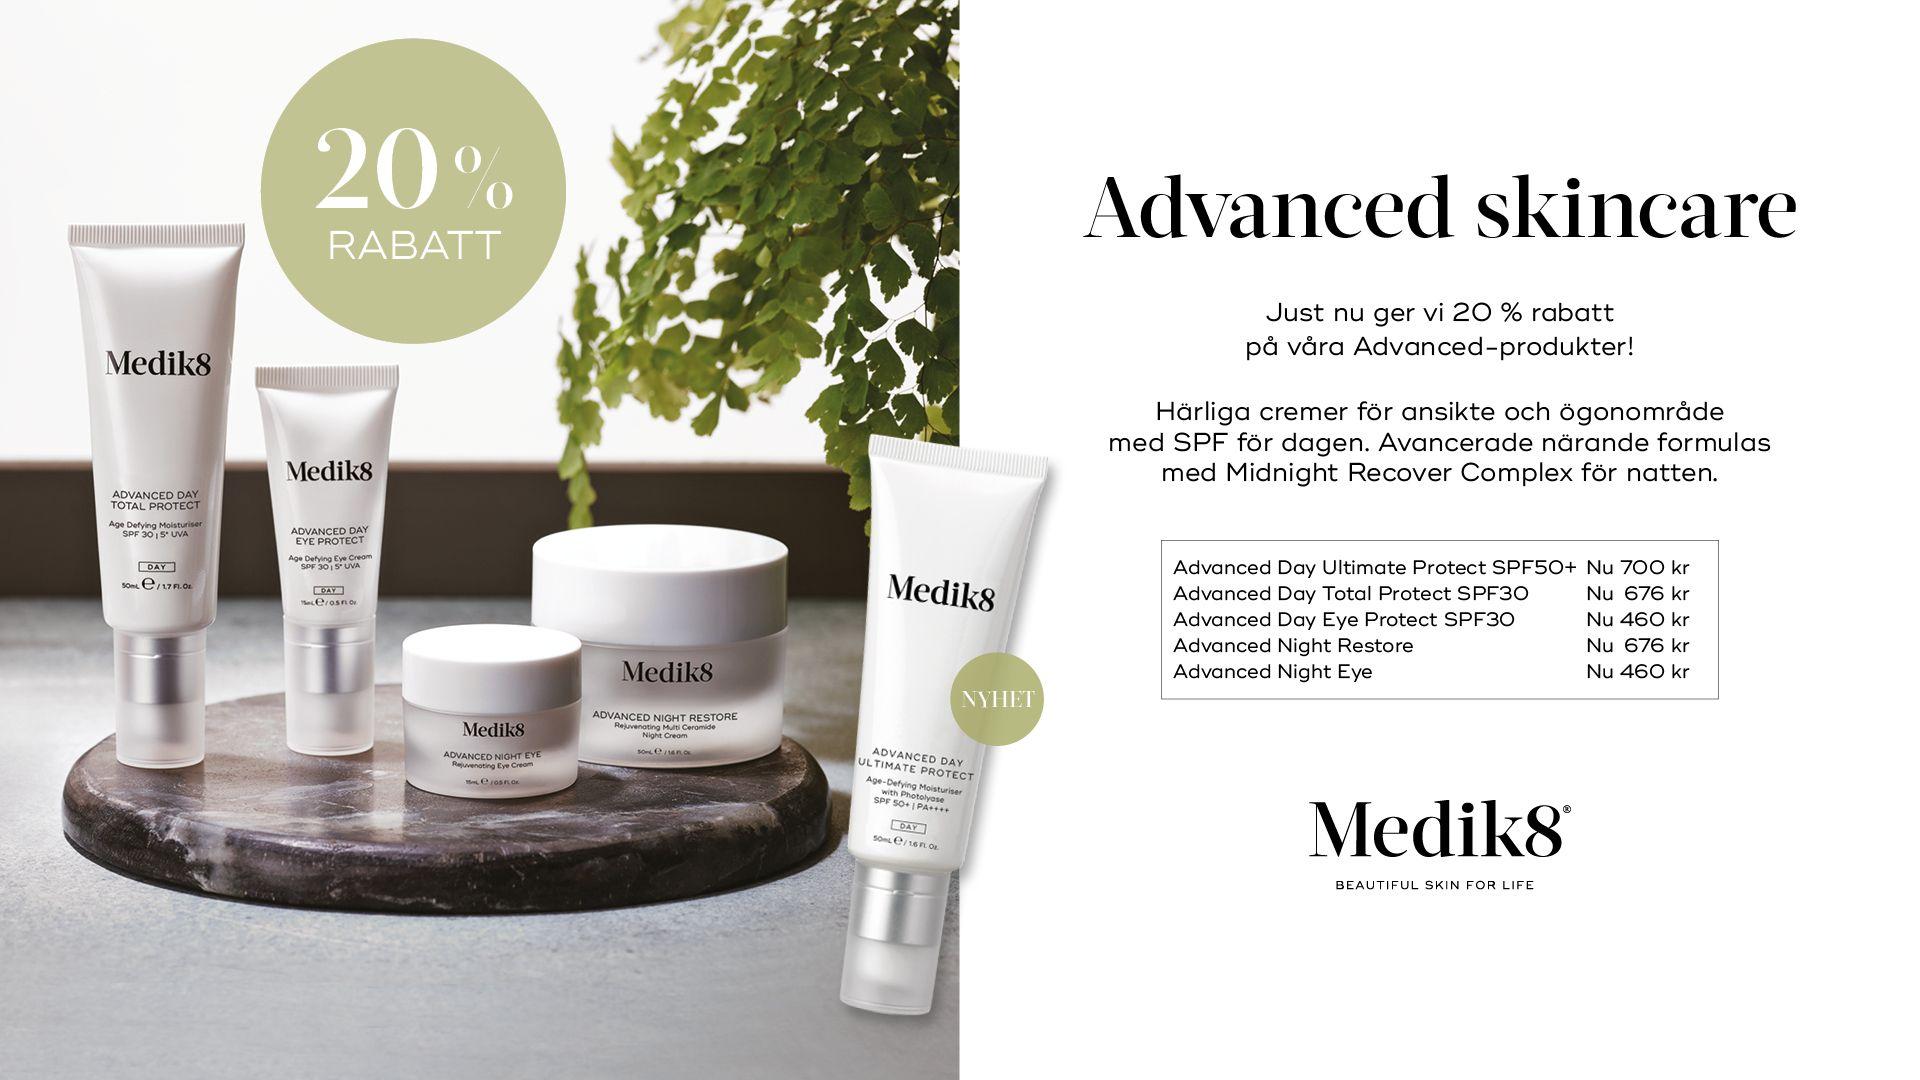 Medik8_advaced_20%